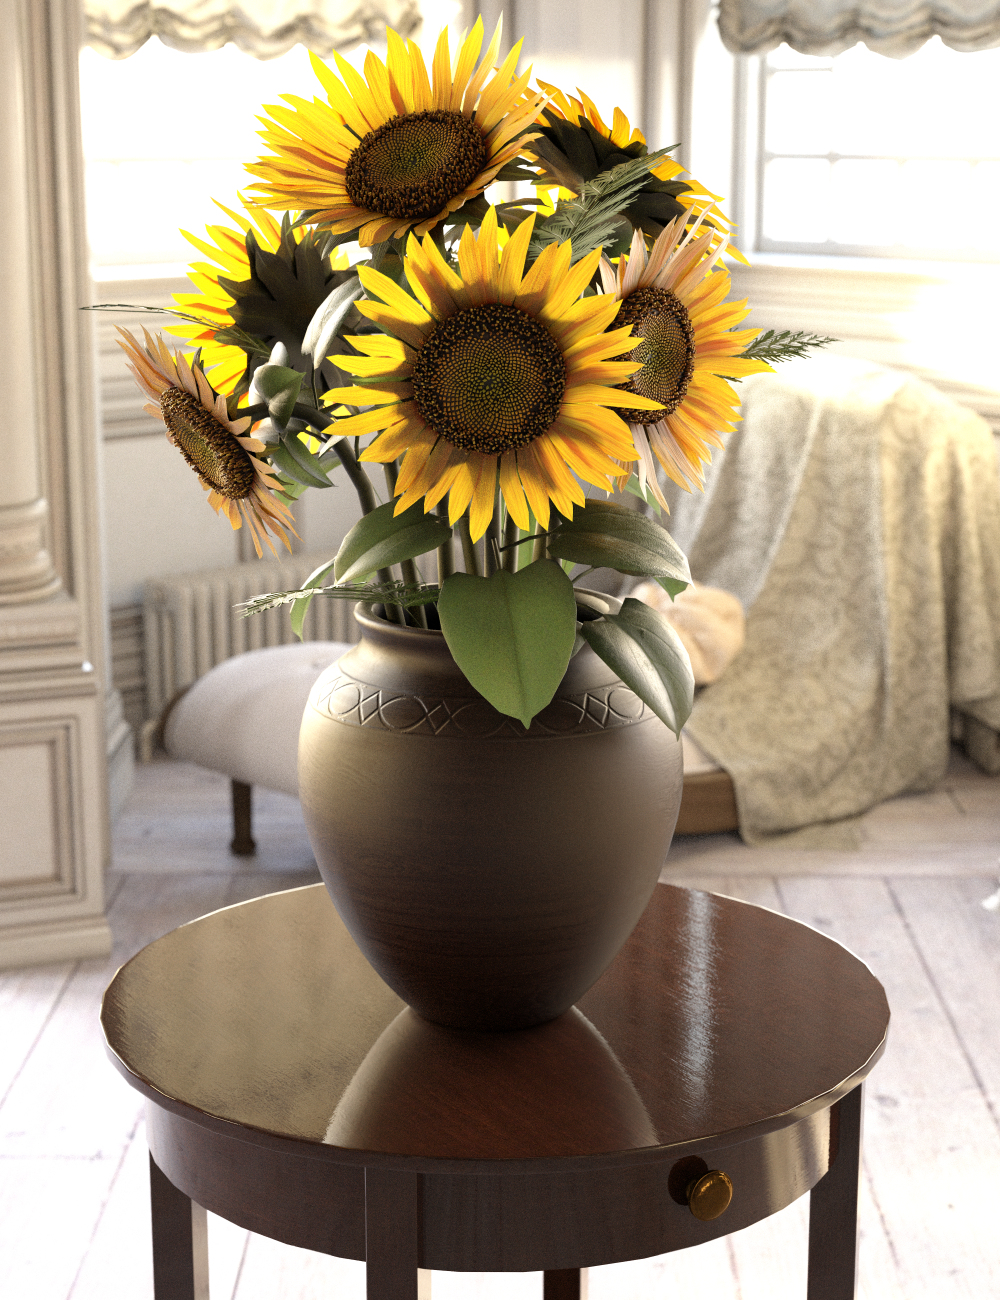 Sunflower Adornment by: Merlin Studios, 3D Models by Daz 3D